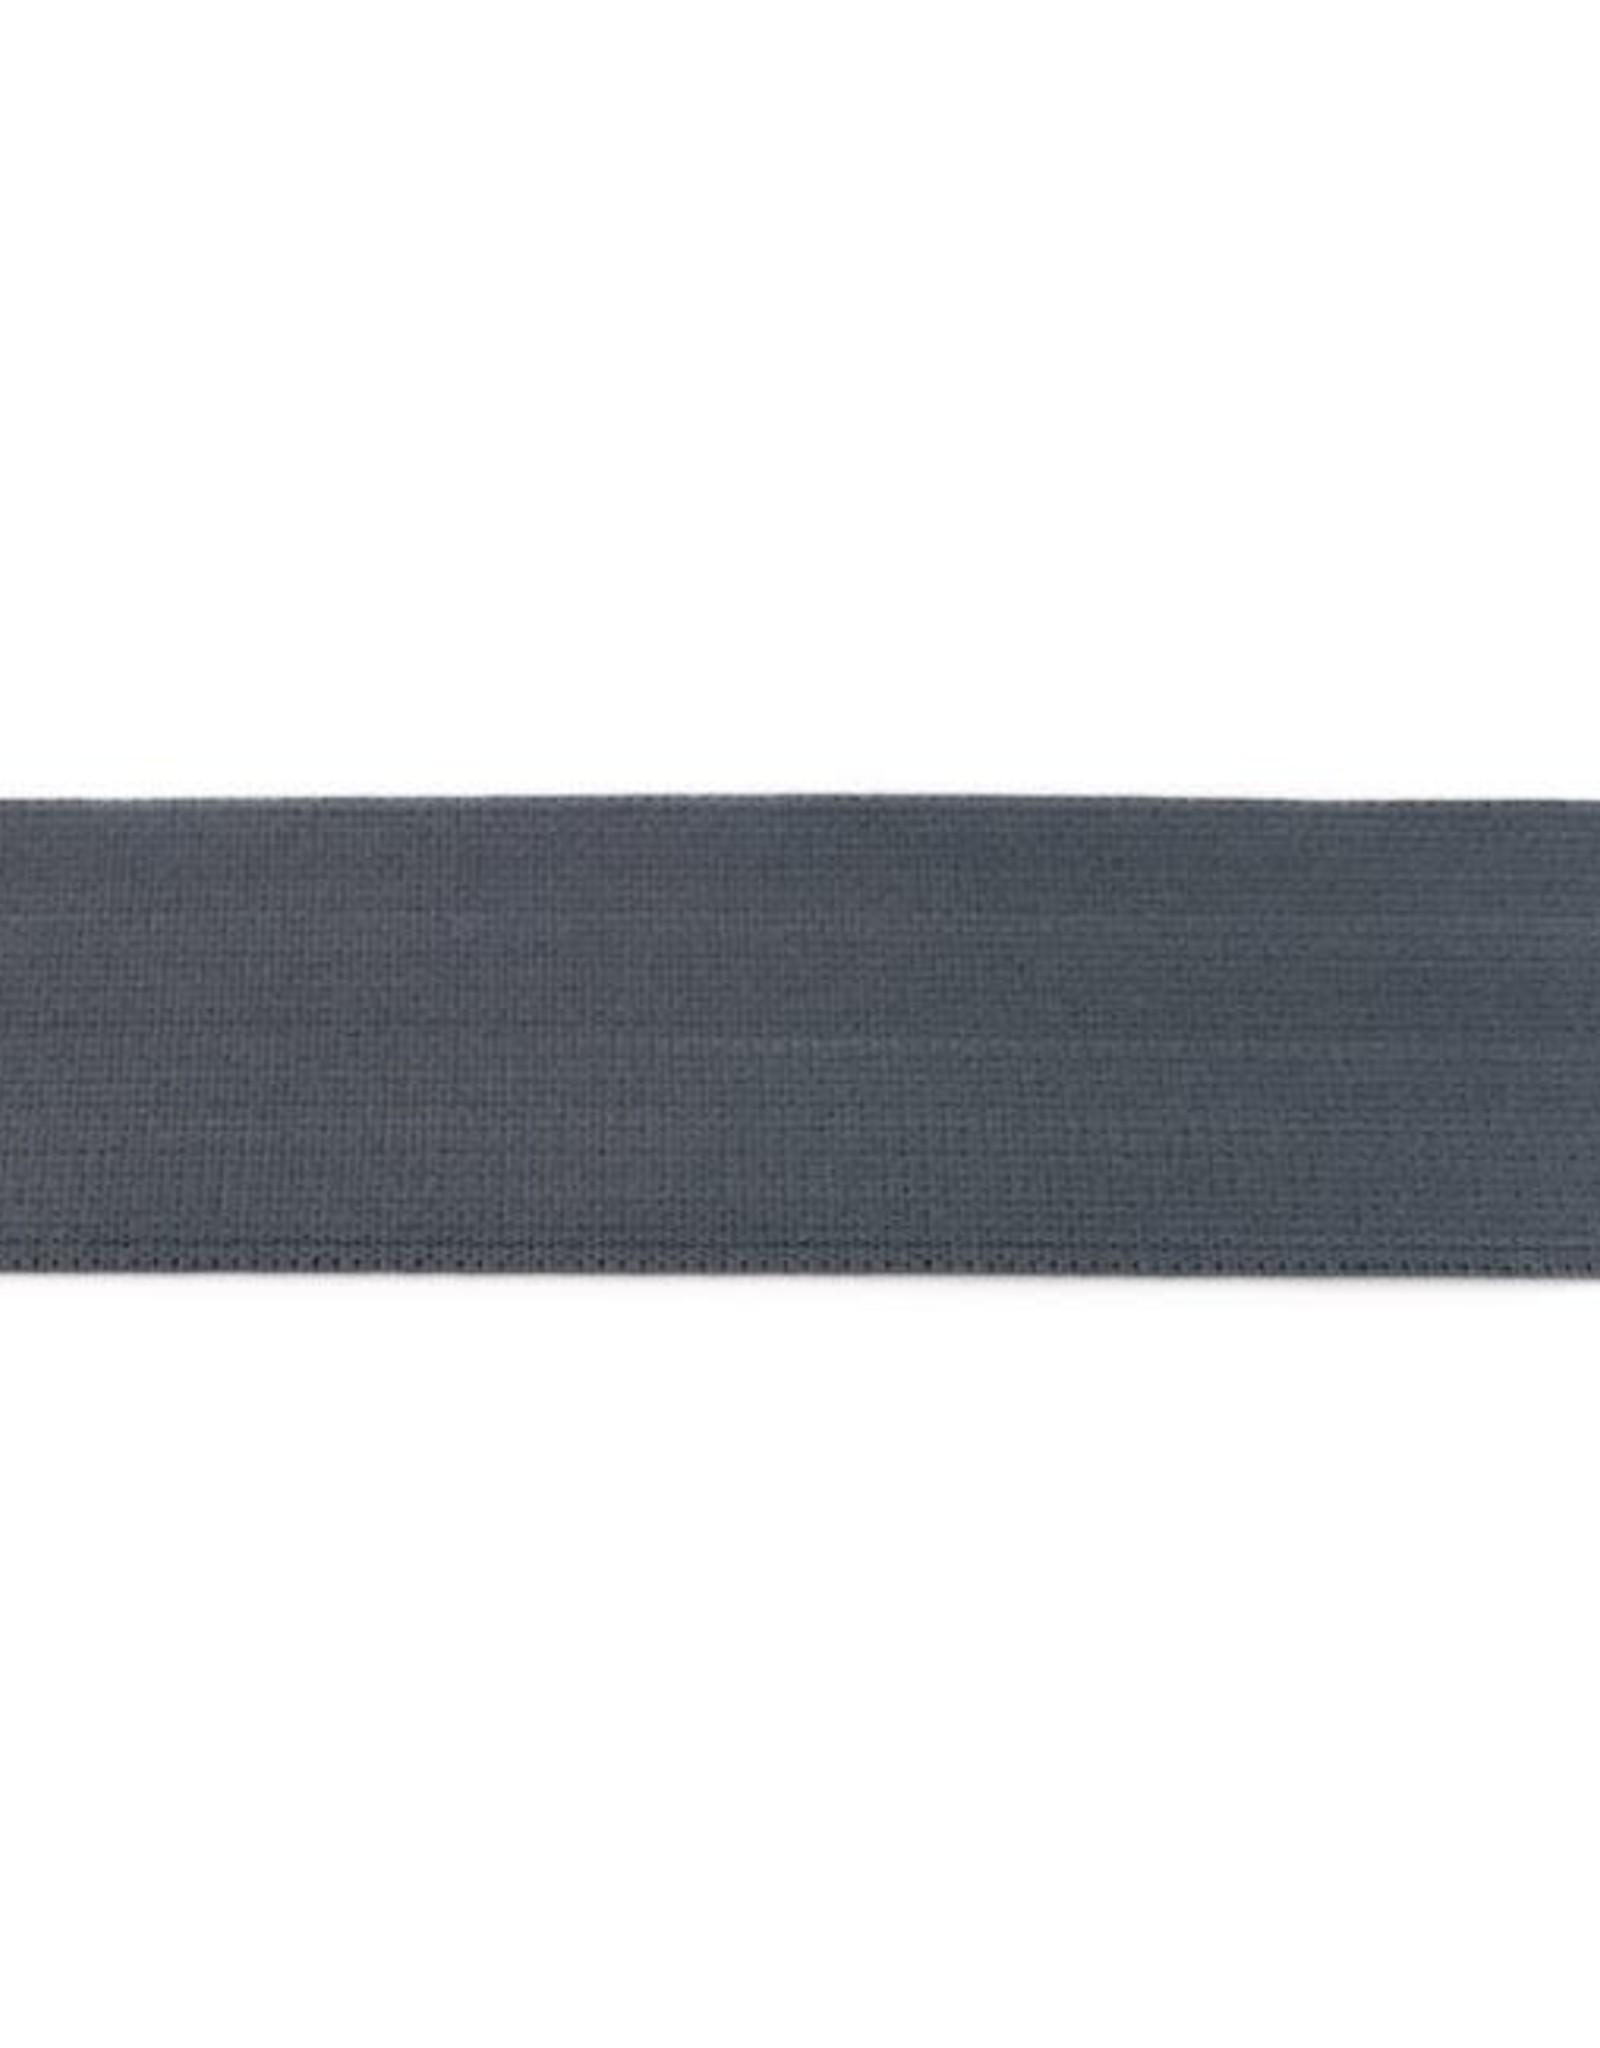 Soft elastiek 40mm - Donkergrijs